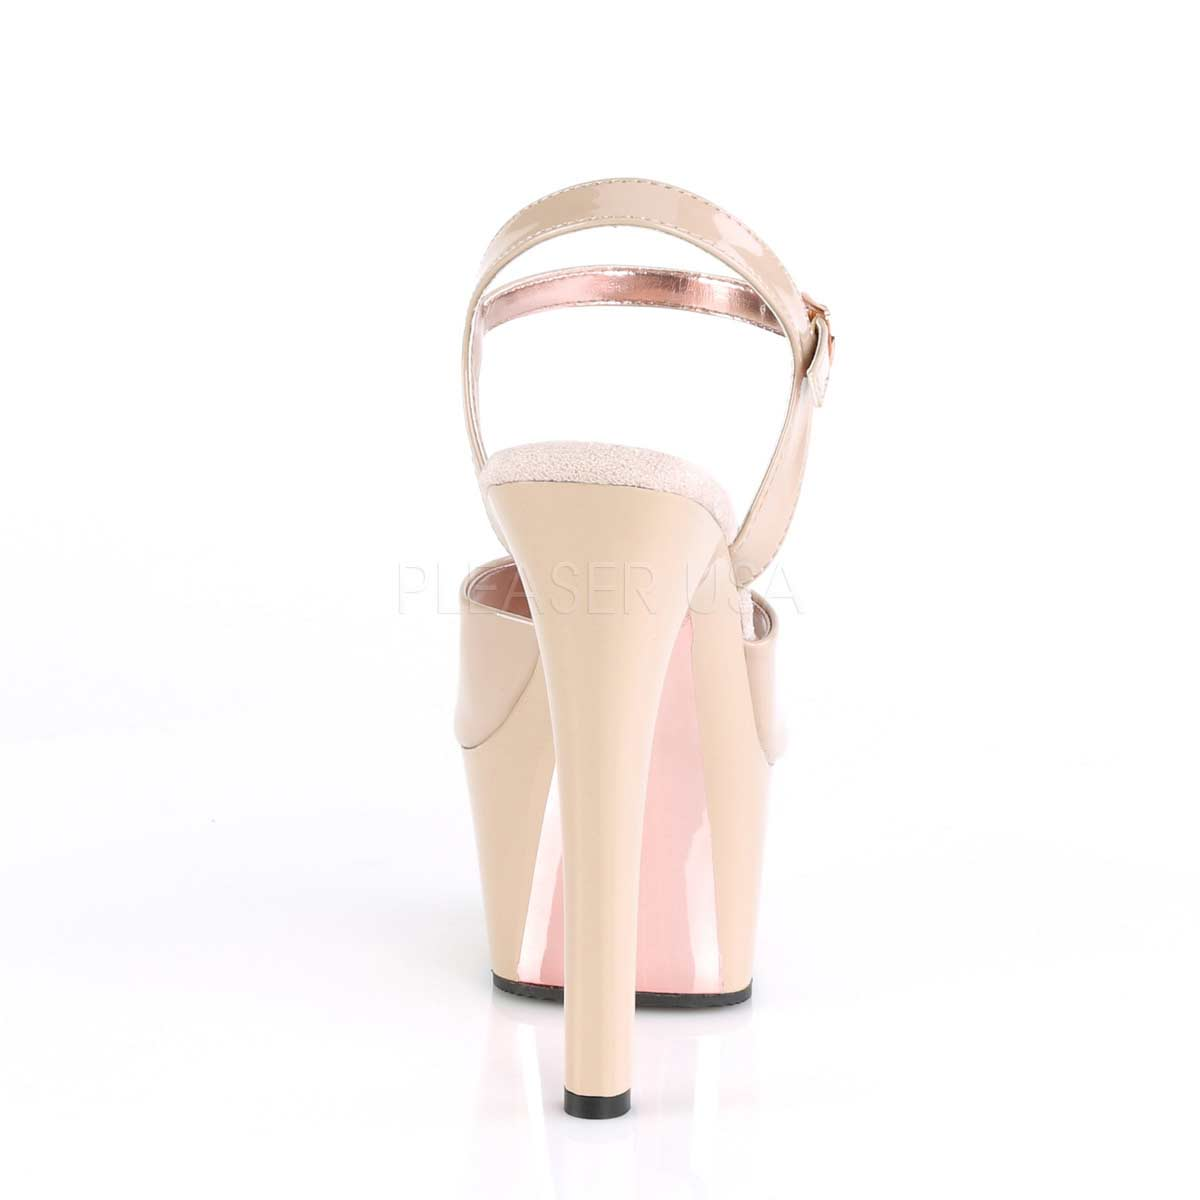 ASPIRE-609TT Nude & Rose Gold Chrome Heels - Tragic Beautiful